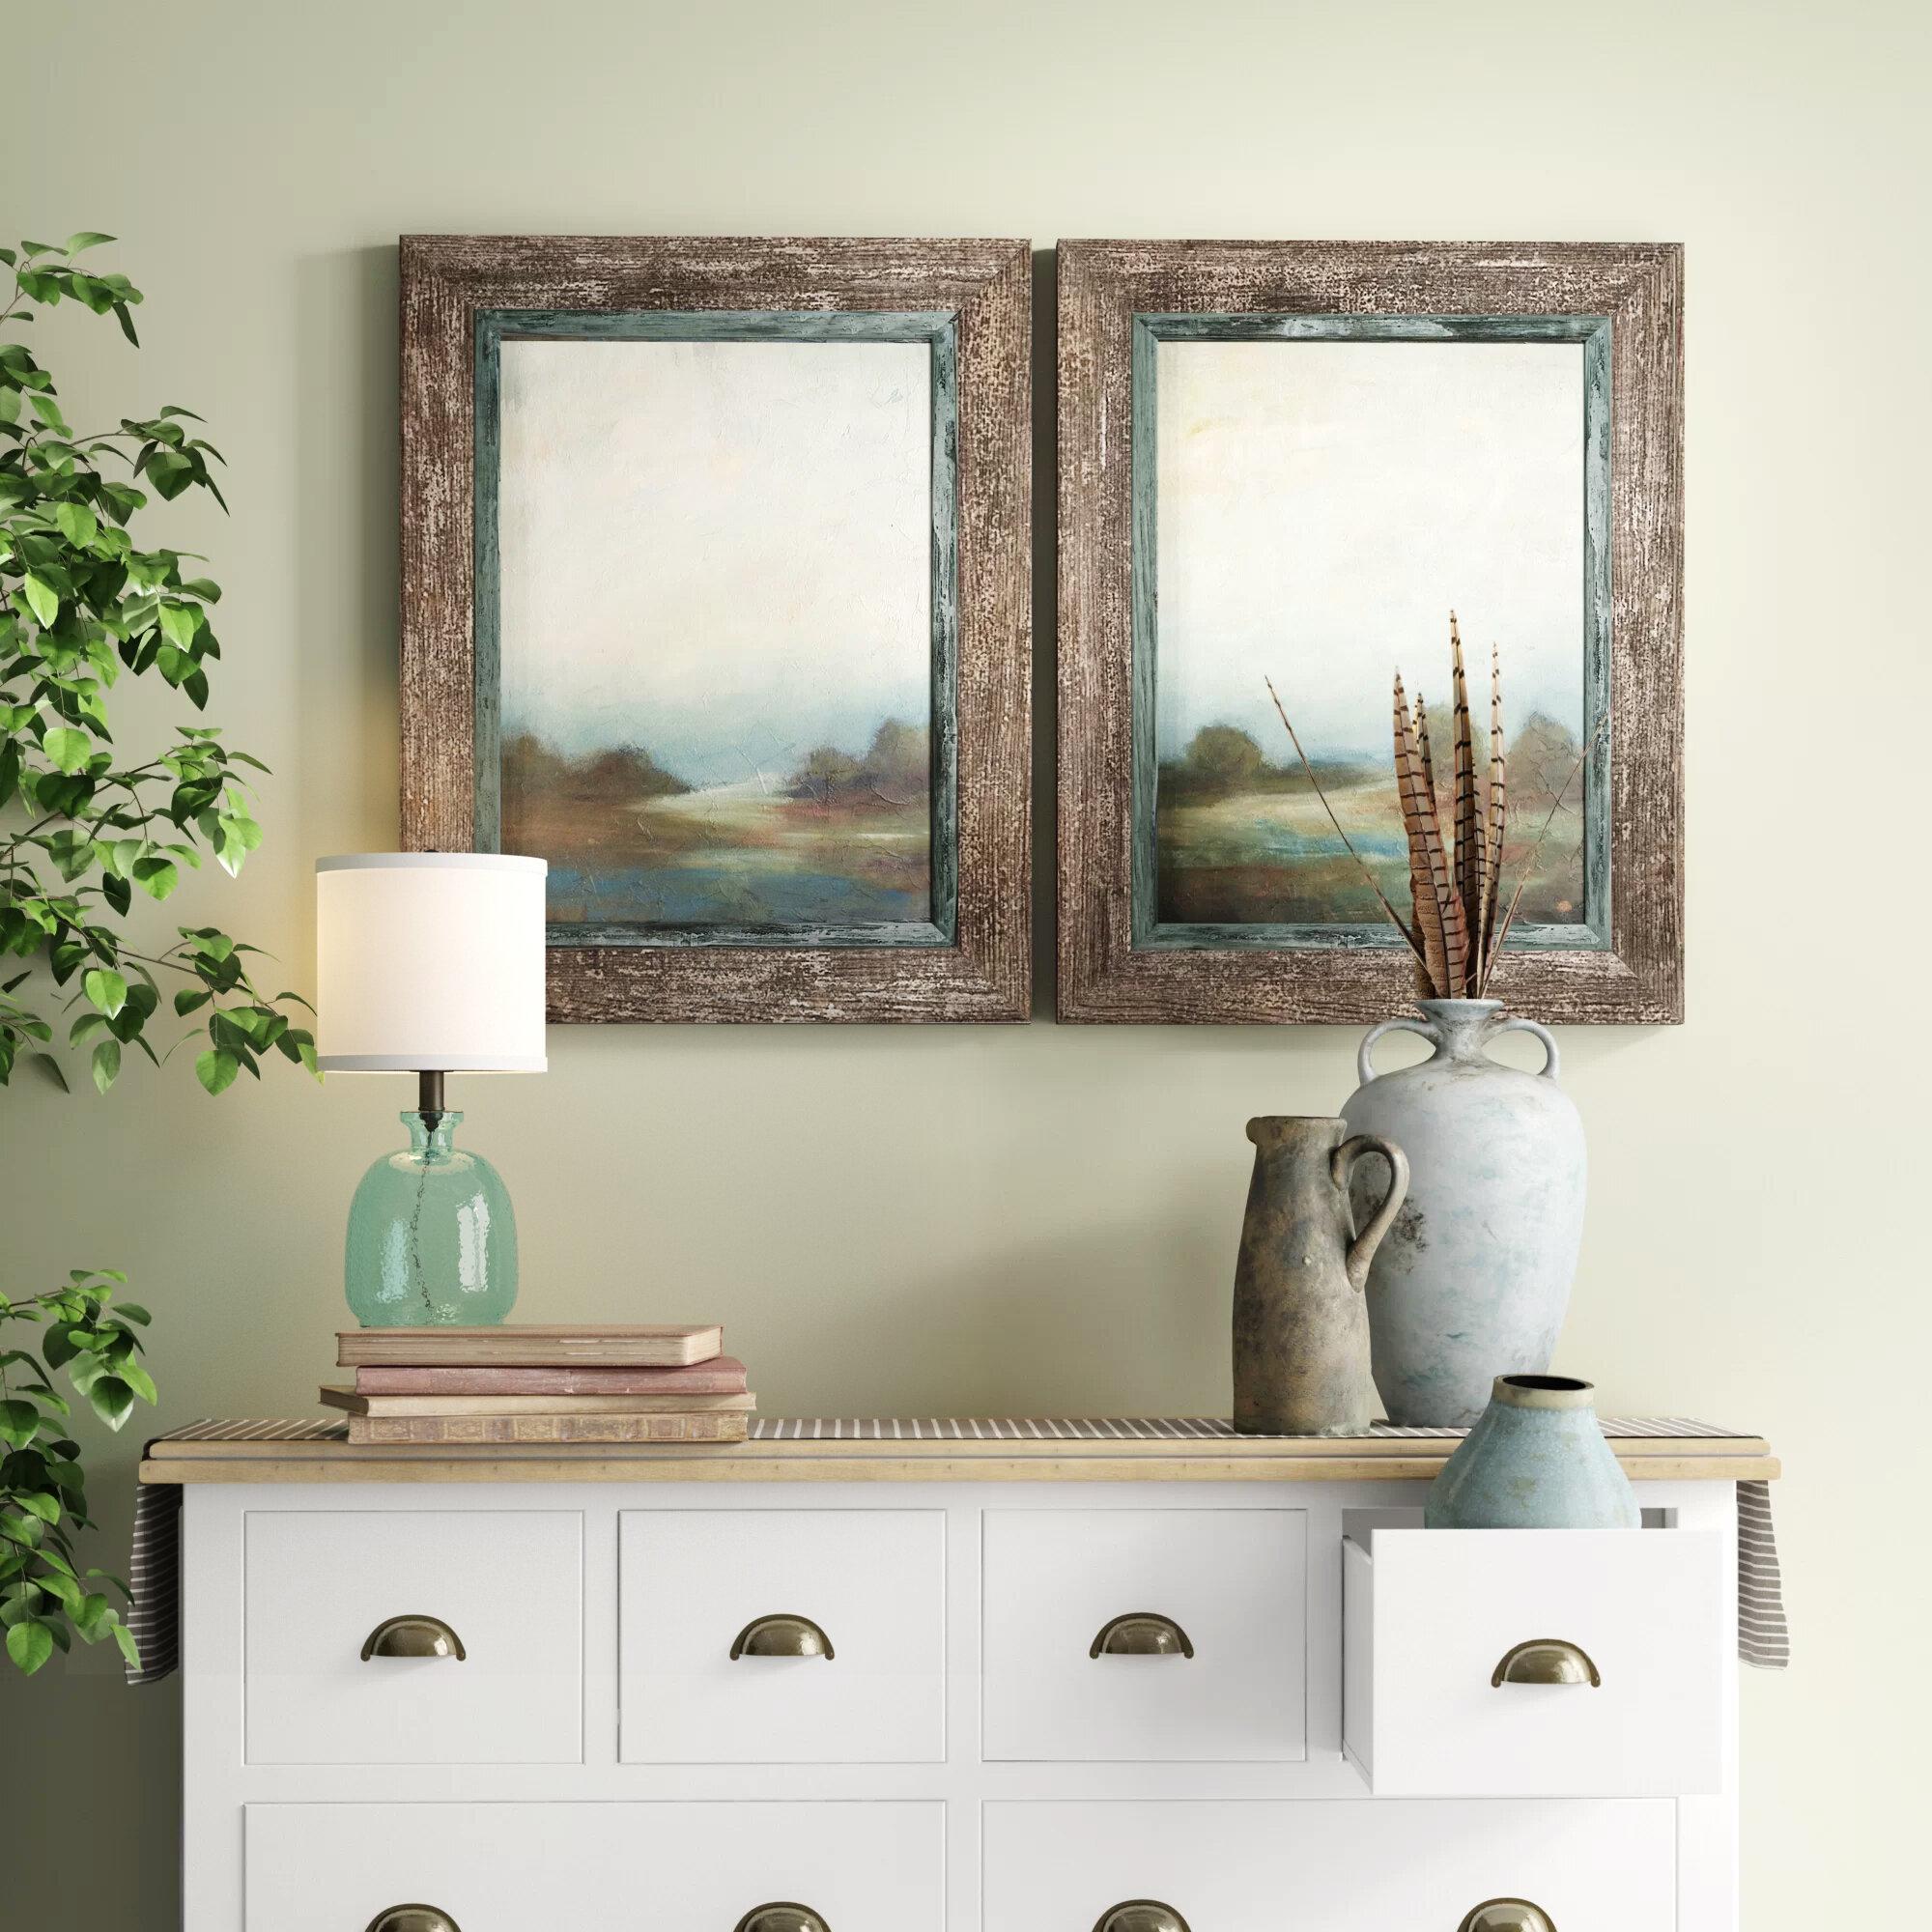 Farmhouse & Rustic Framed Wall Art | Birch Lane for Floral Wreath Wood Framed Wall Decor (Image 10 of 30)